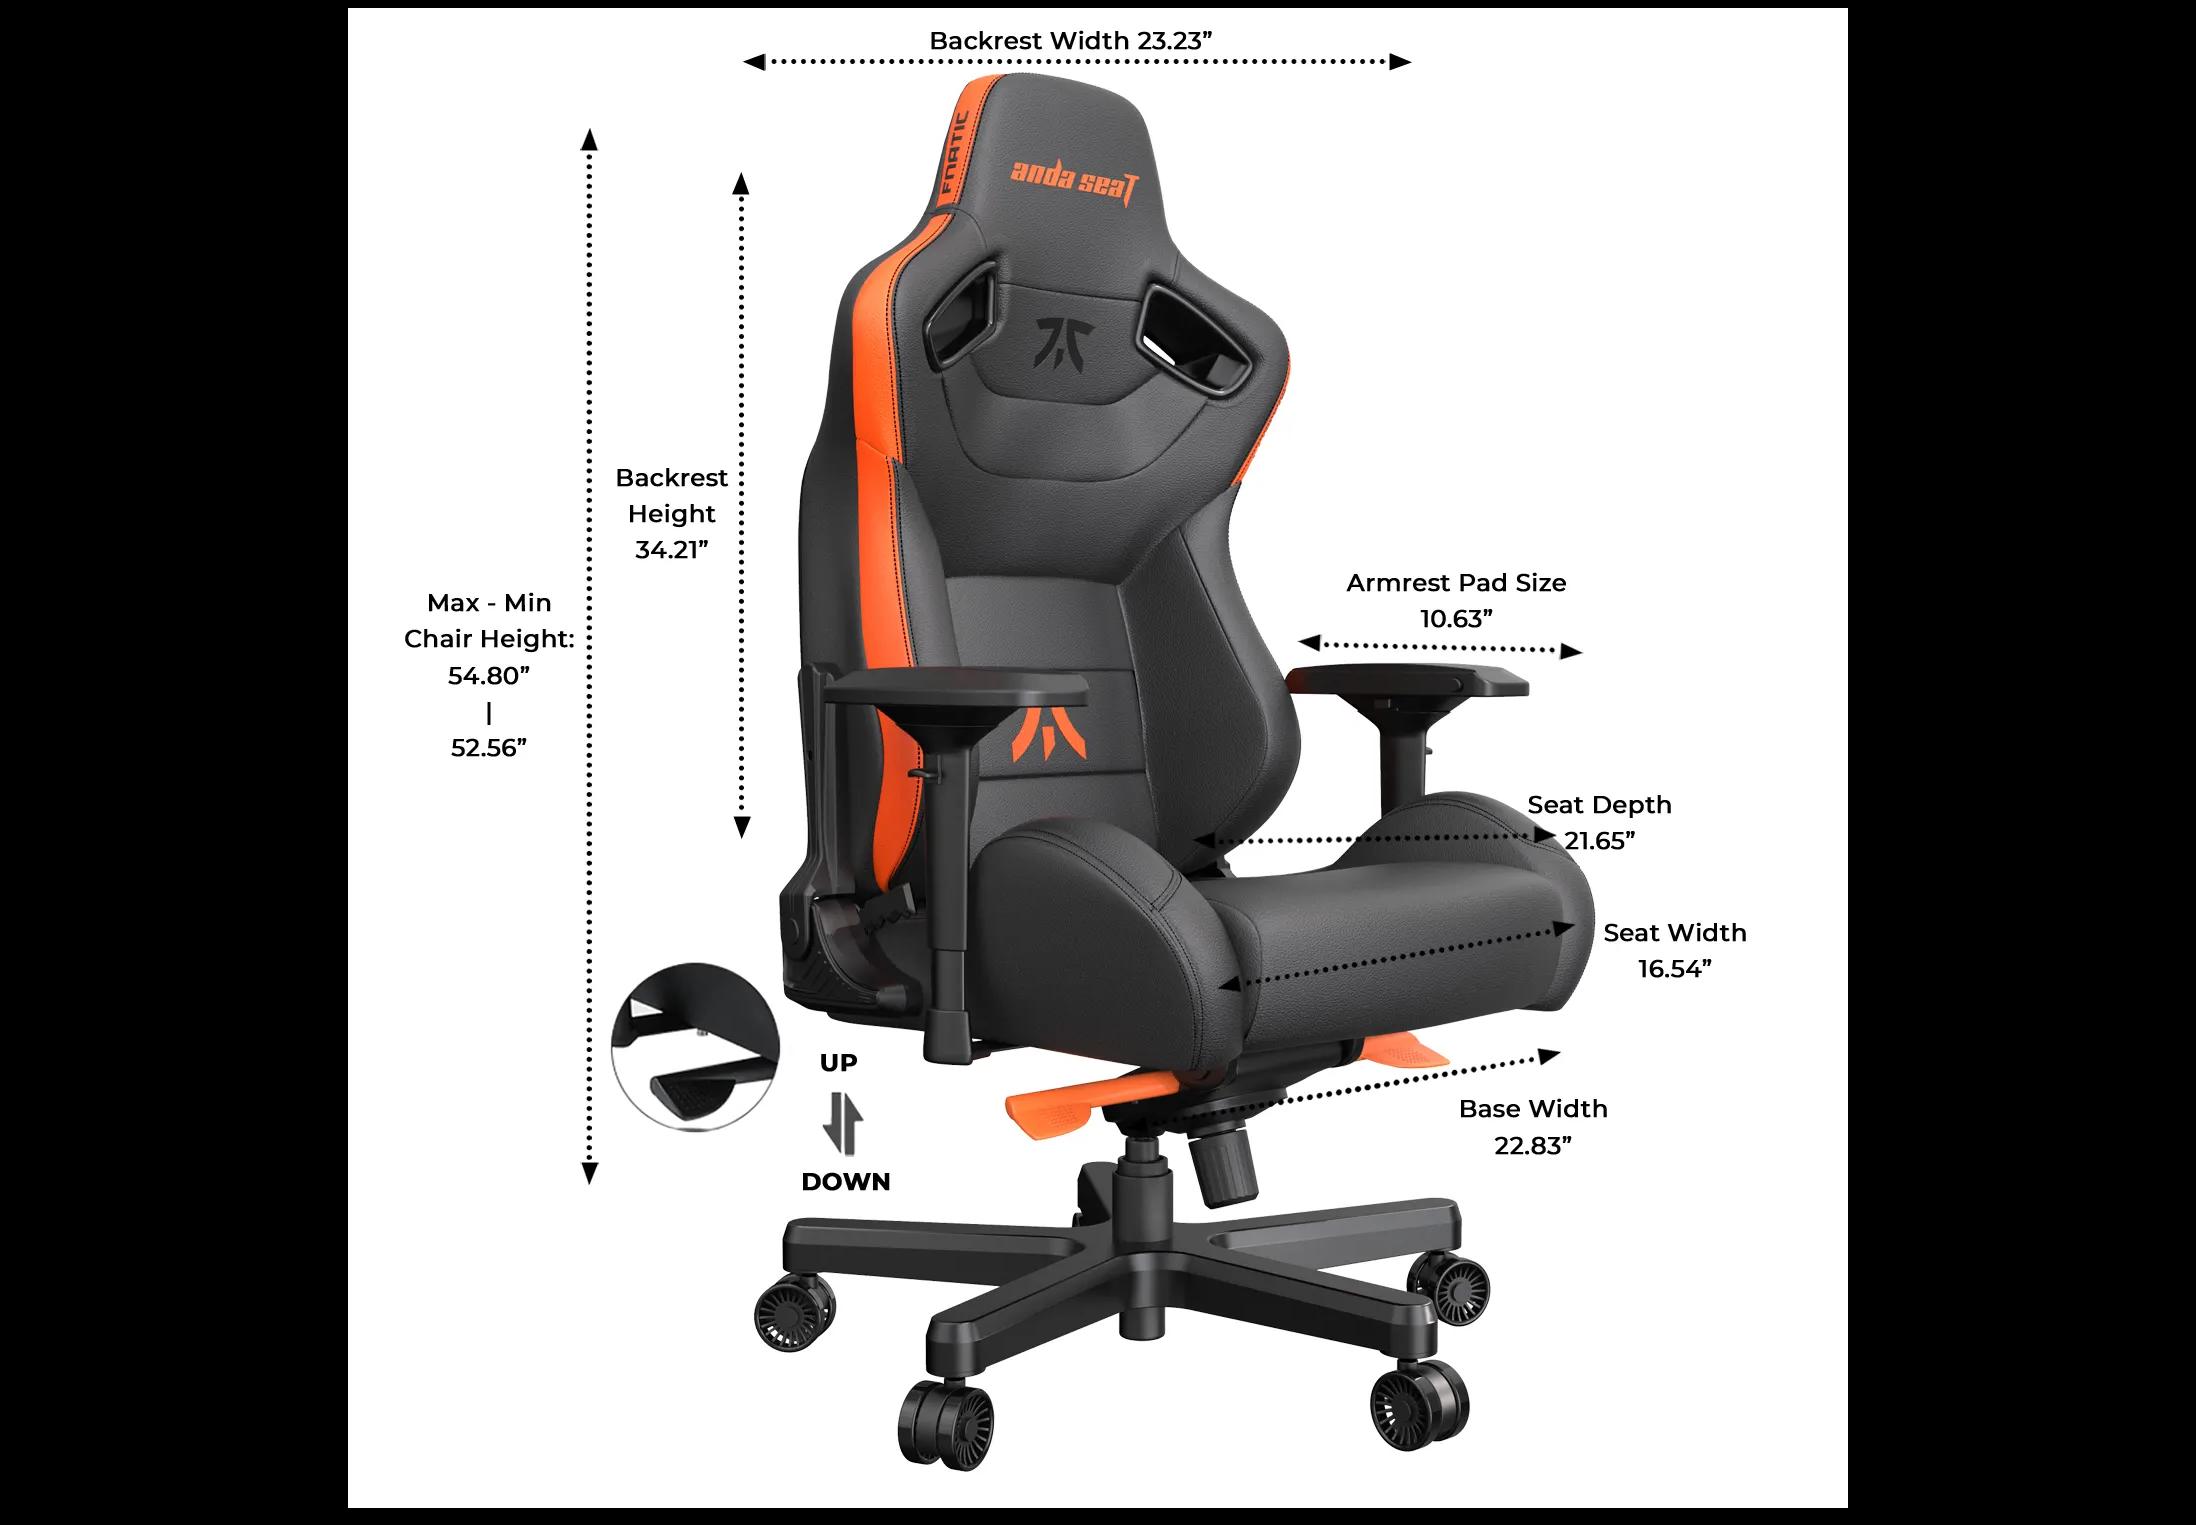 Product_奇妙_Anda Seat Fnatic Edition Premium Gaming Chair